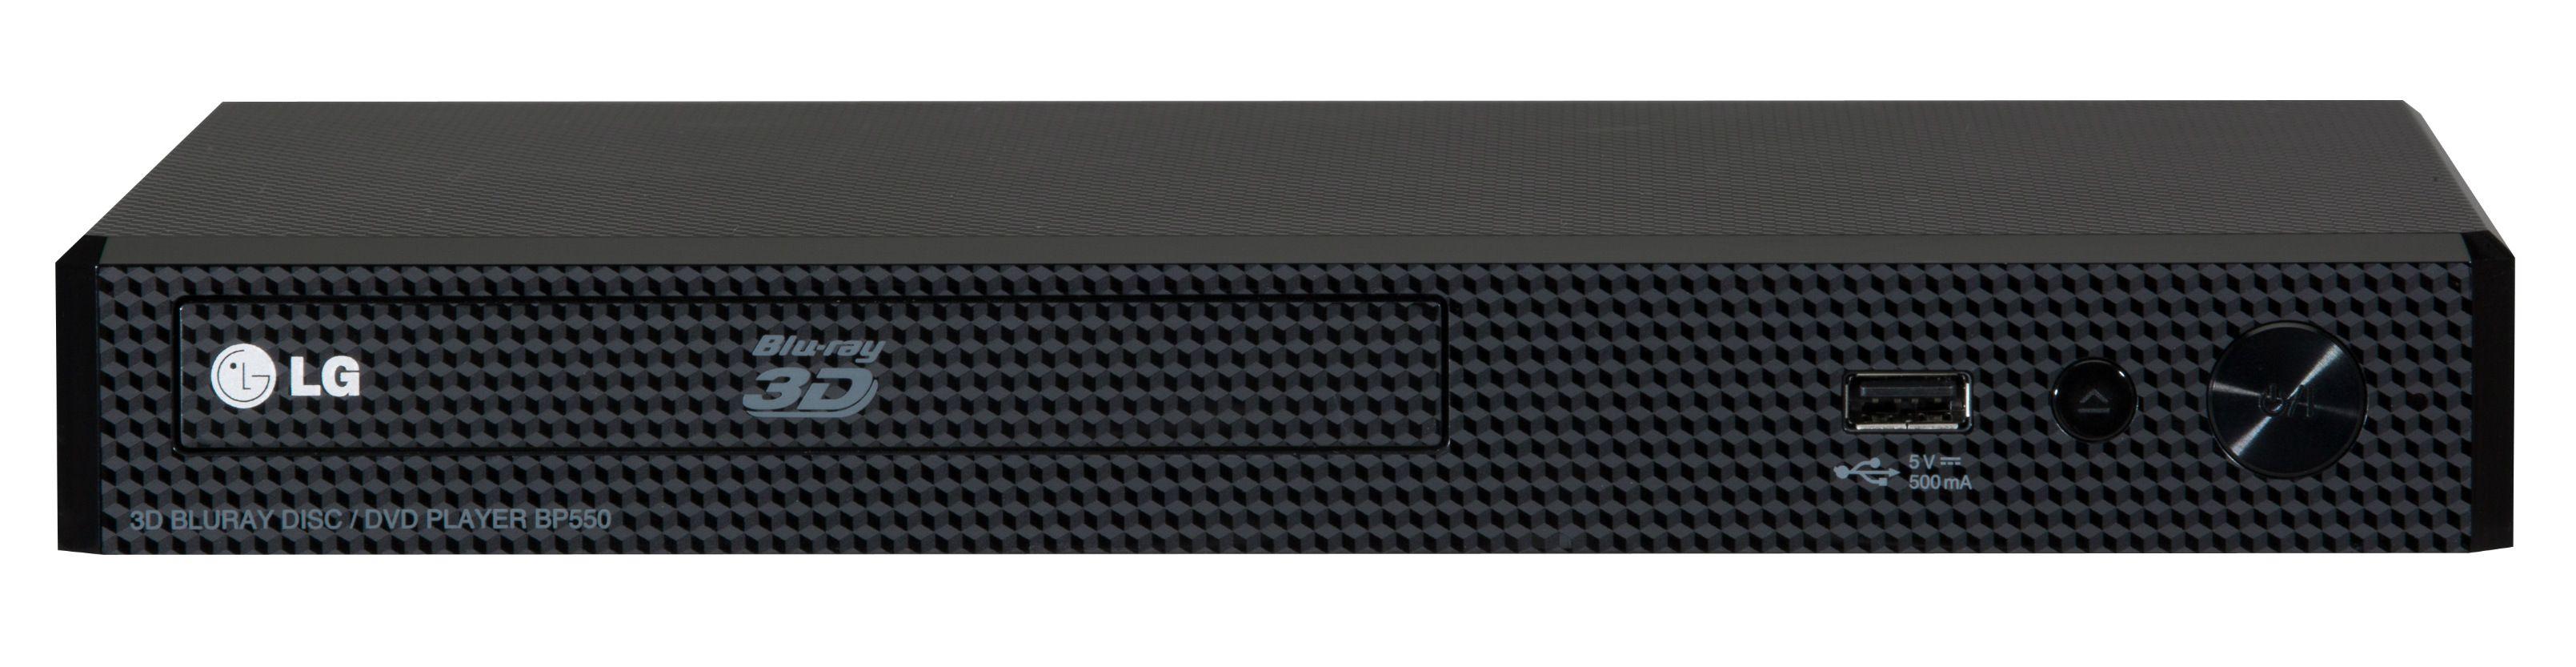 LG BP556 Bluray player Blu ray player, Blu ray, Amazon